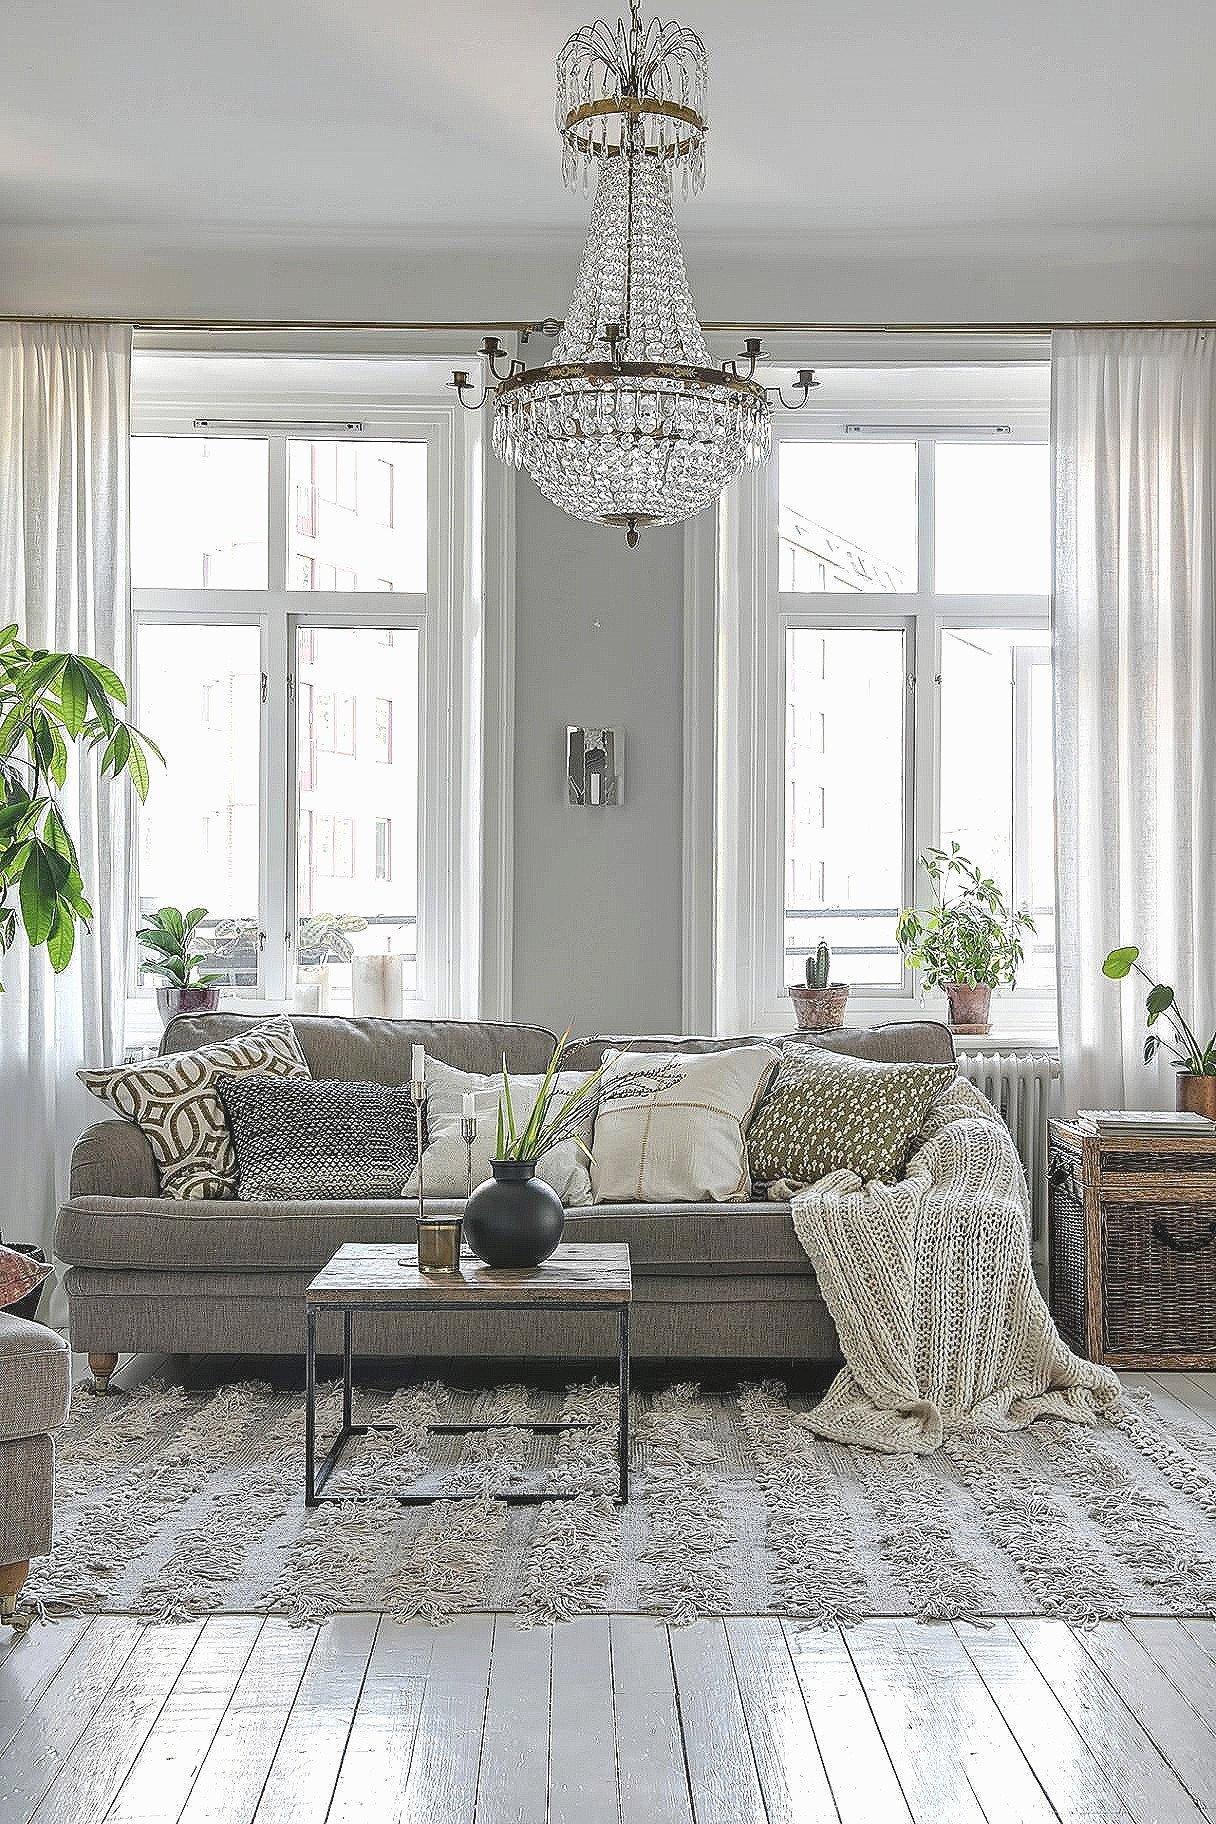 Cute Light for Bedroom Fresh 30 attractive Hardwood Floor Decorating Ideas